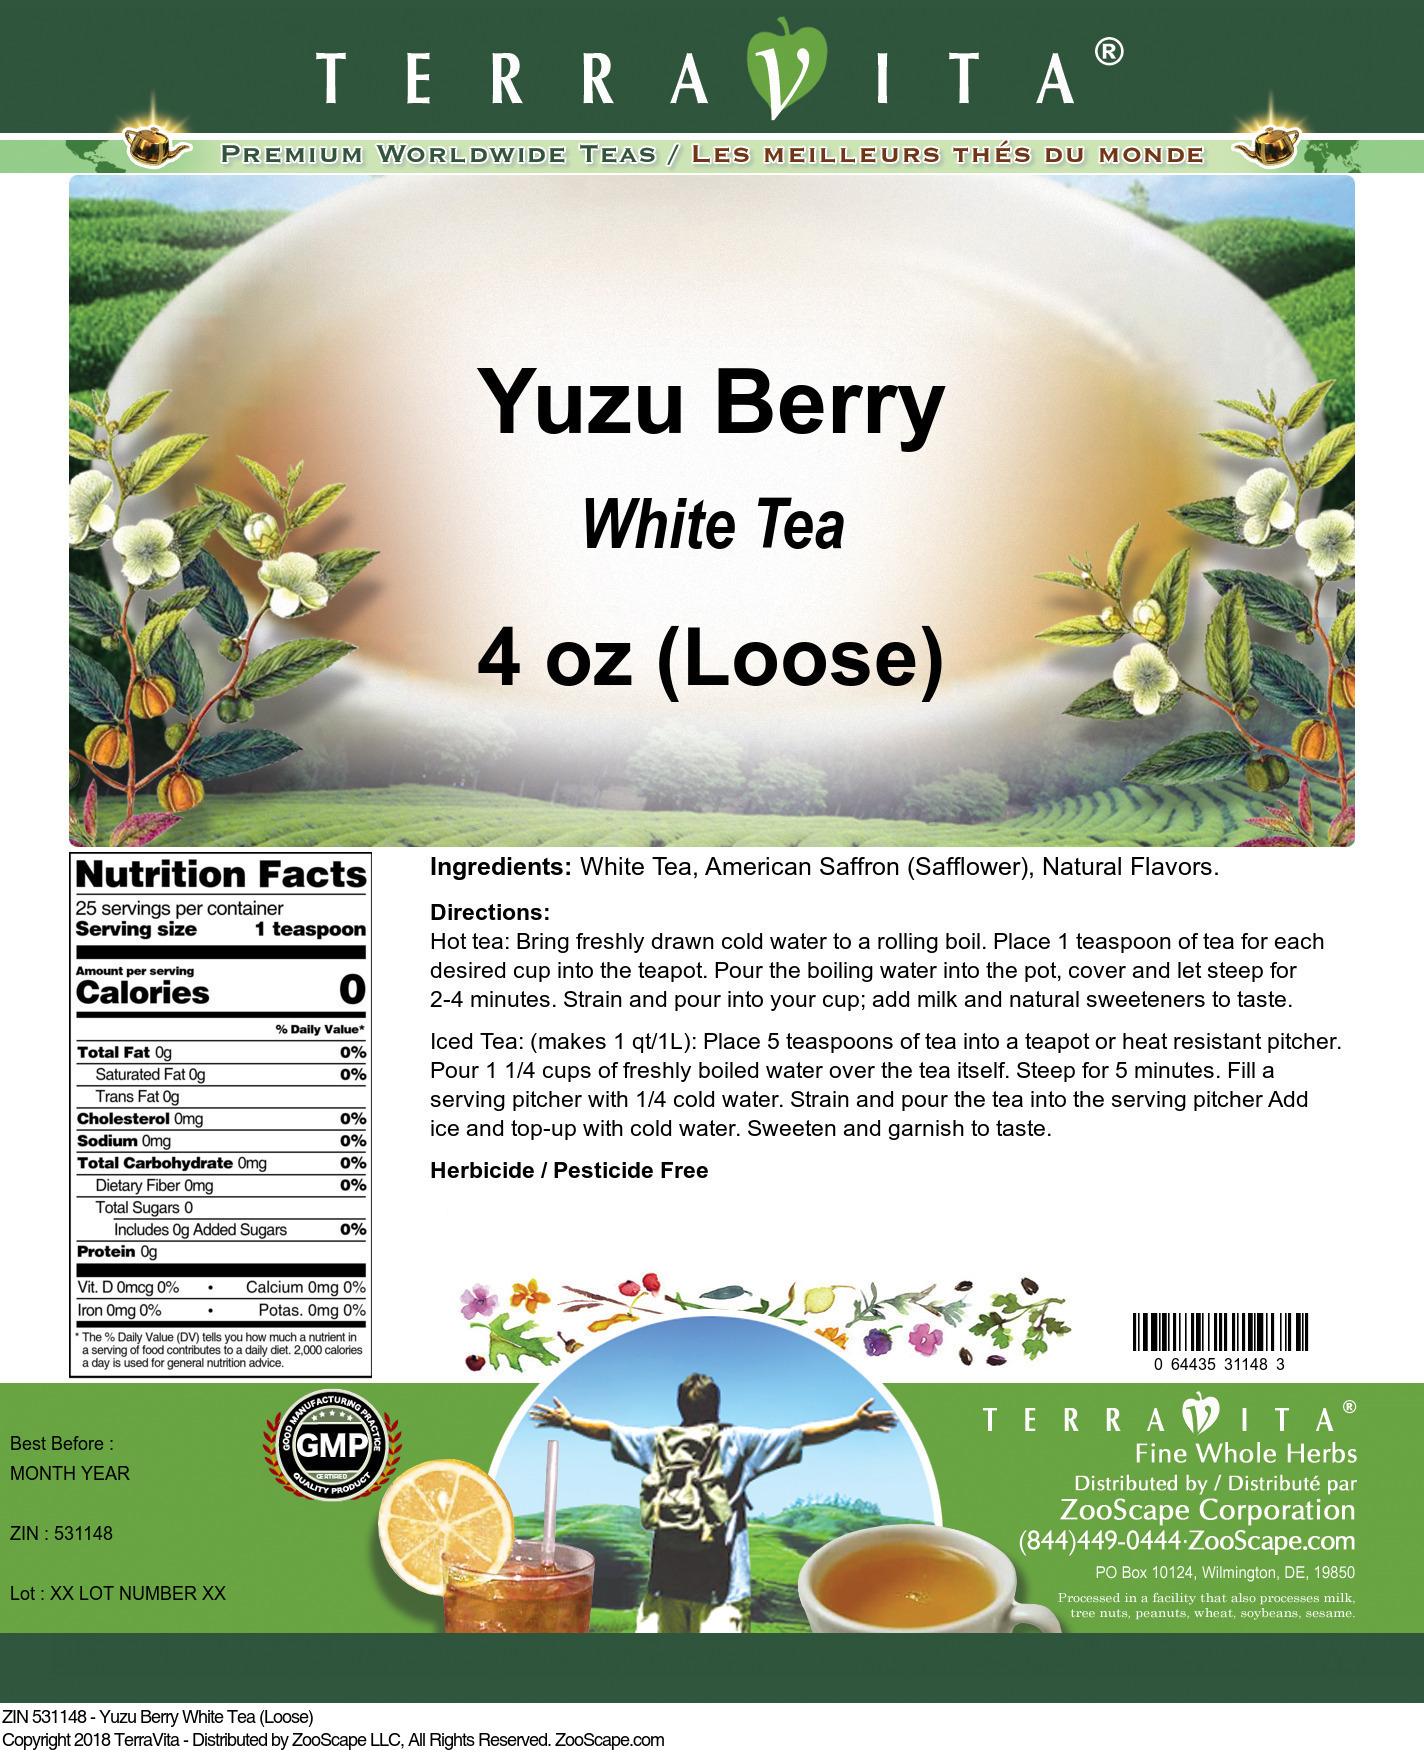 Yuzu Berry White Tea